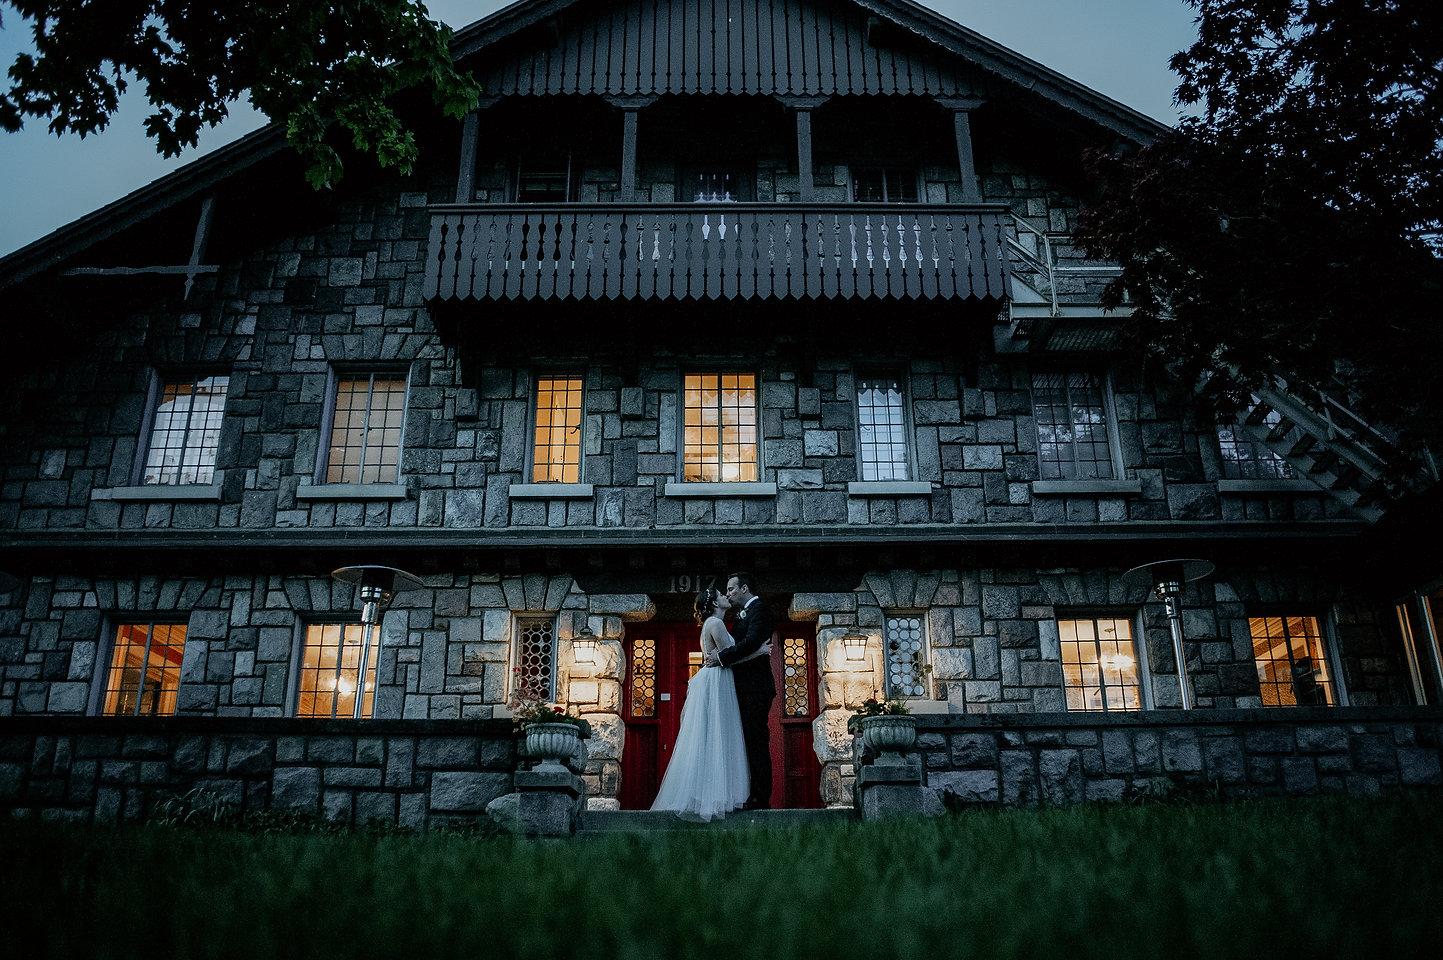 ann arbor wedding stone chalet